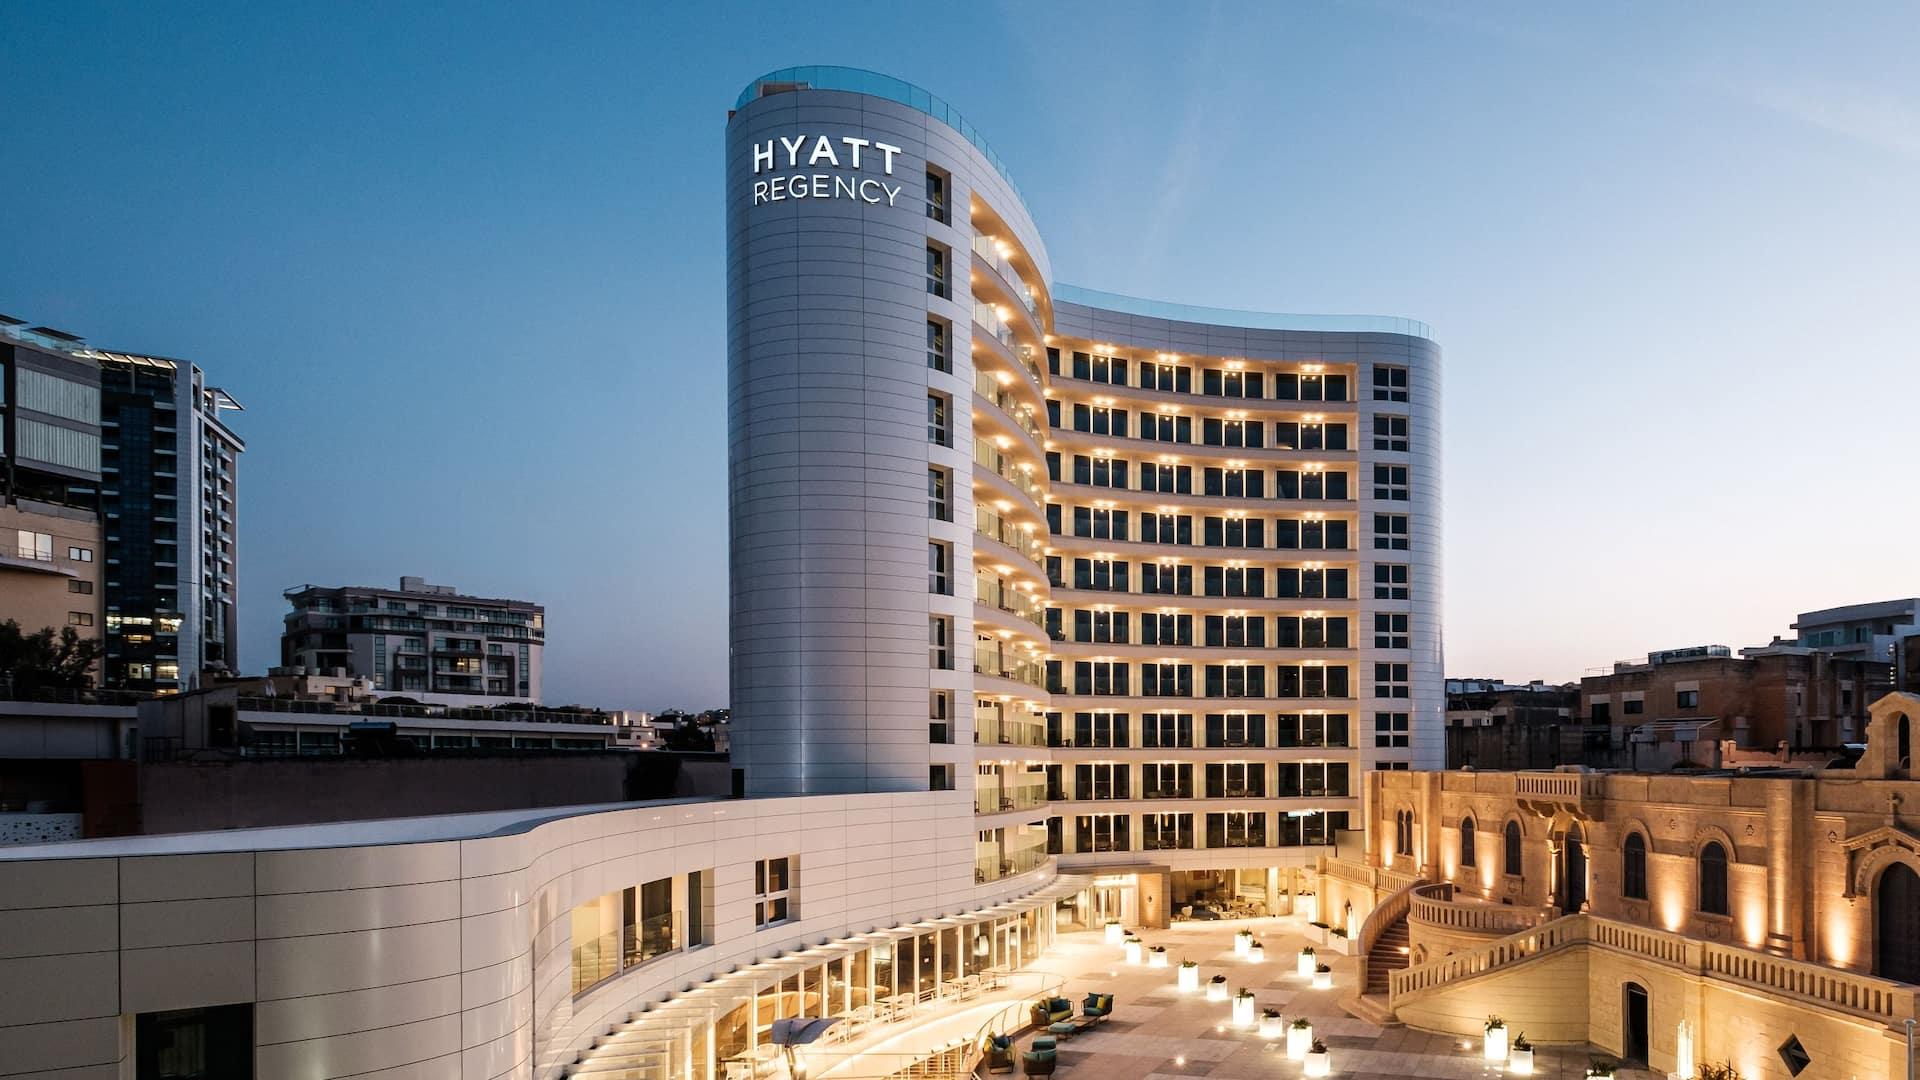 Hyatt Regency Malta is officially open